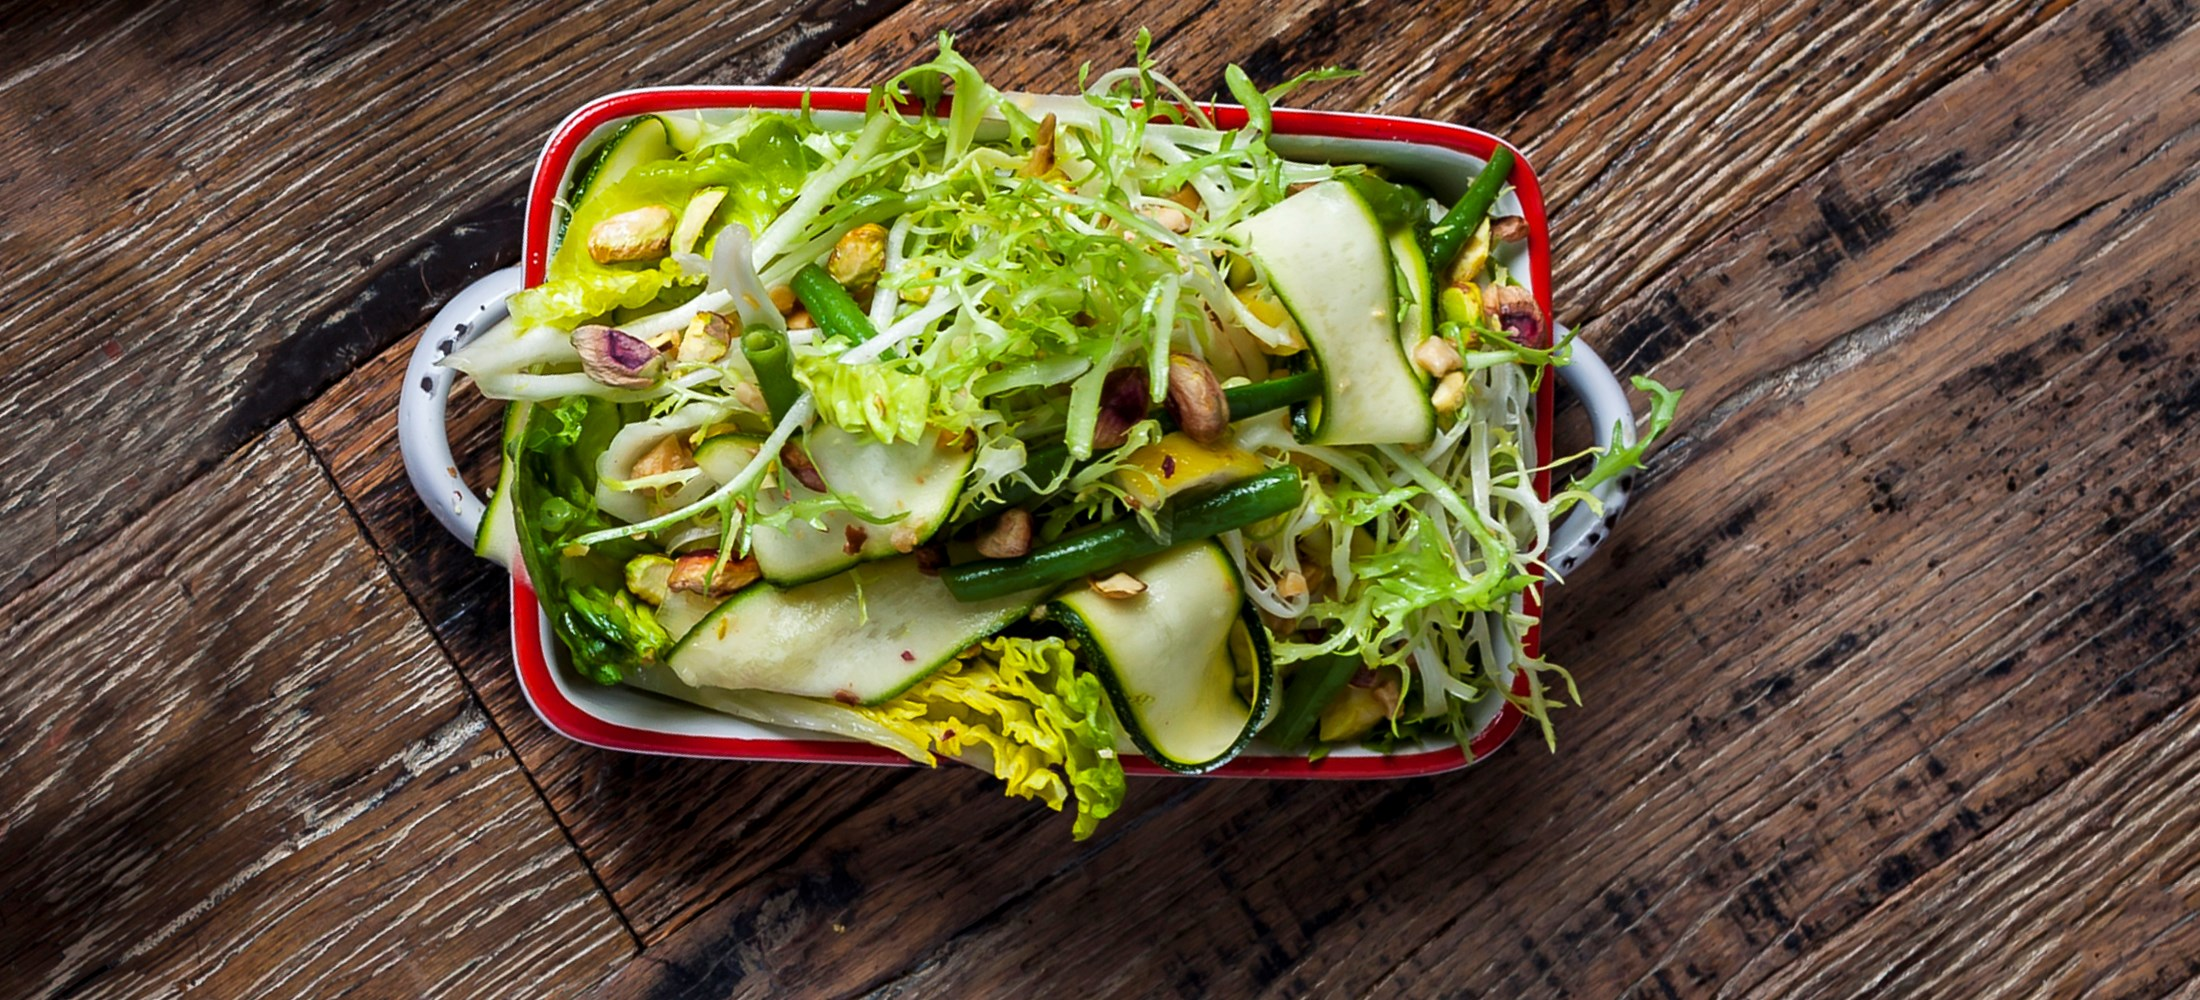 Best Green Salad Recipe